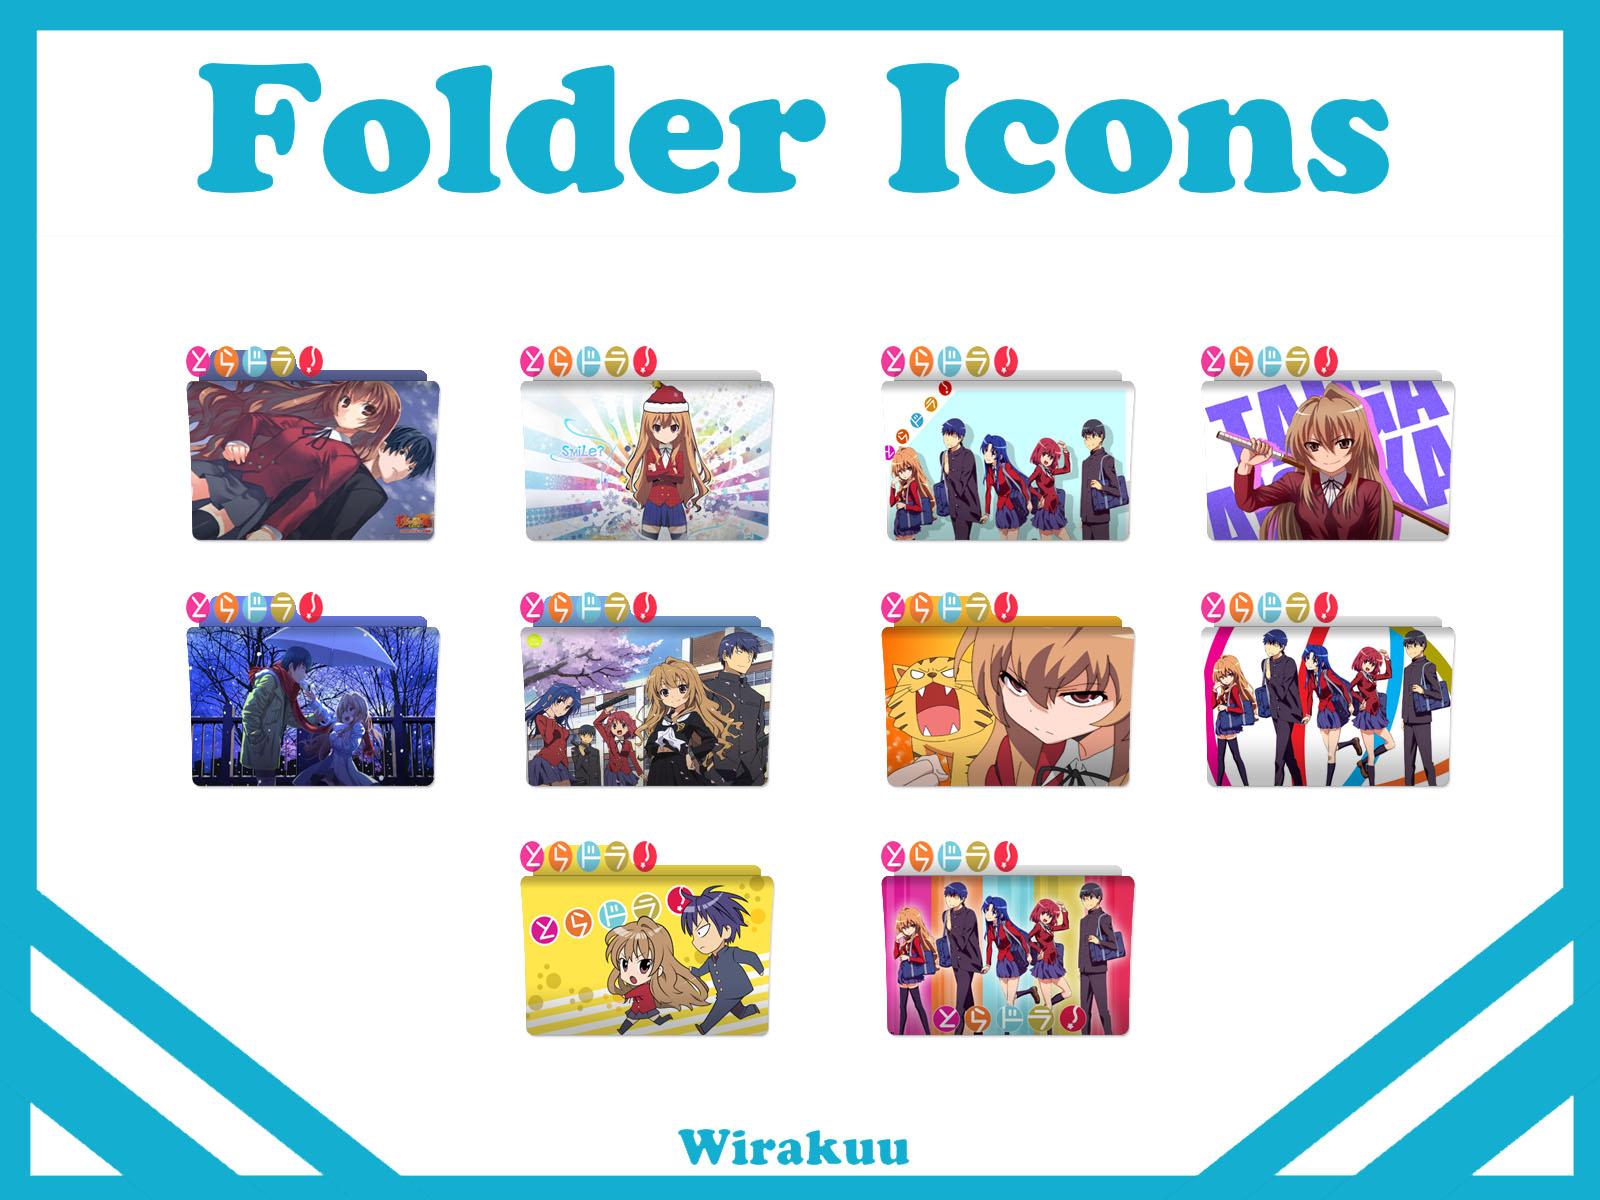 Folder Icons Anime Toradora Wirakuu